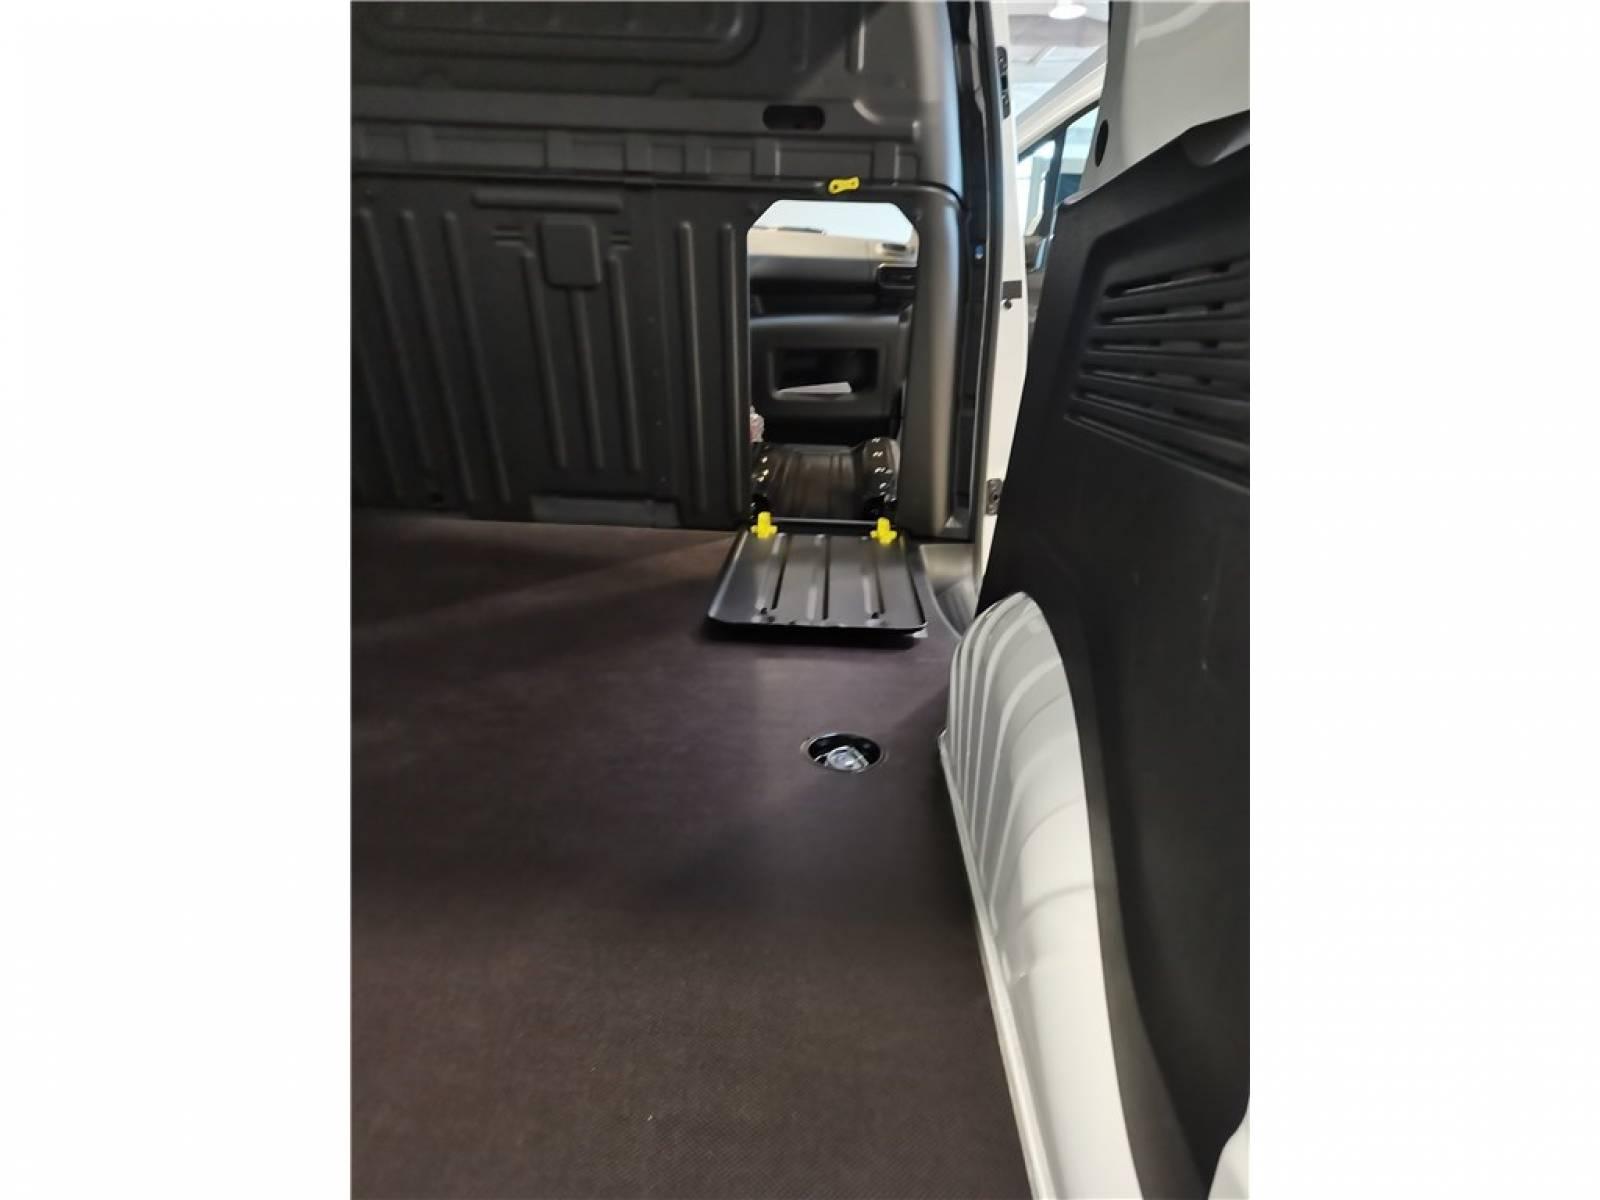 OPEL COMBO CARGO 1.5 100 CH L1H1 STANDARD - véhicule d'occasion - Groupe Guillet - Opel Magicauto - Chalon-sur-Saône - 71380 - Saint-Marcel - 10